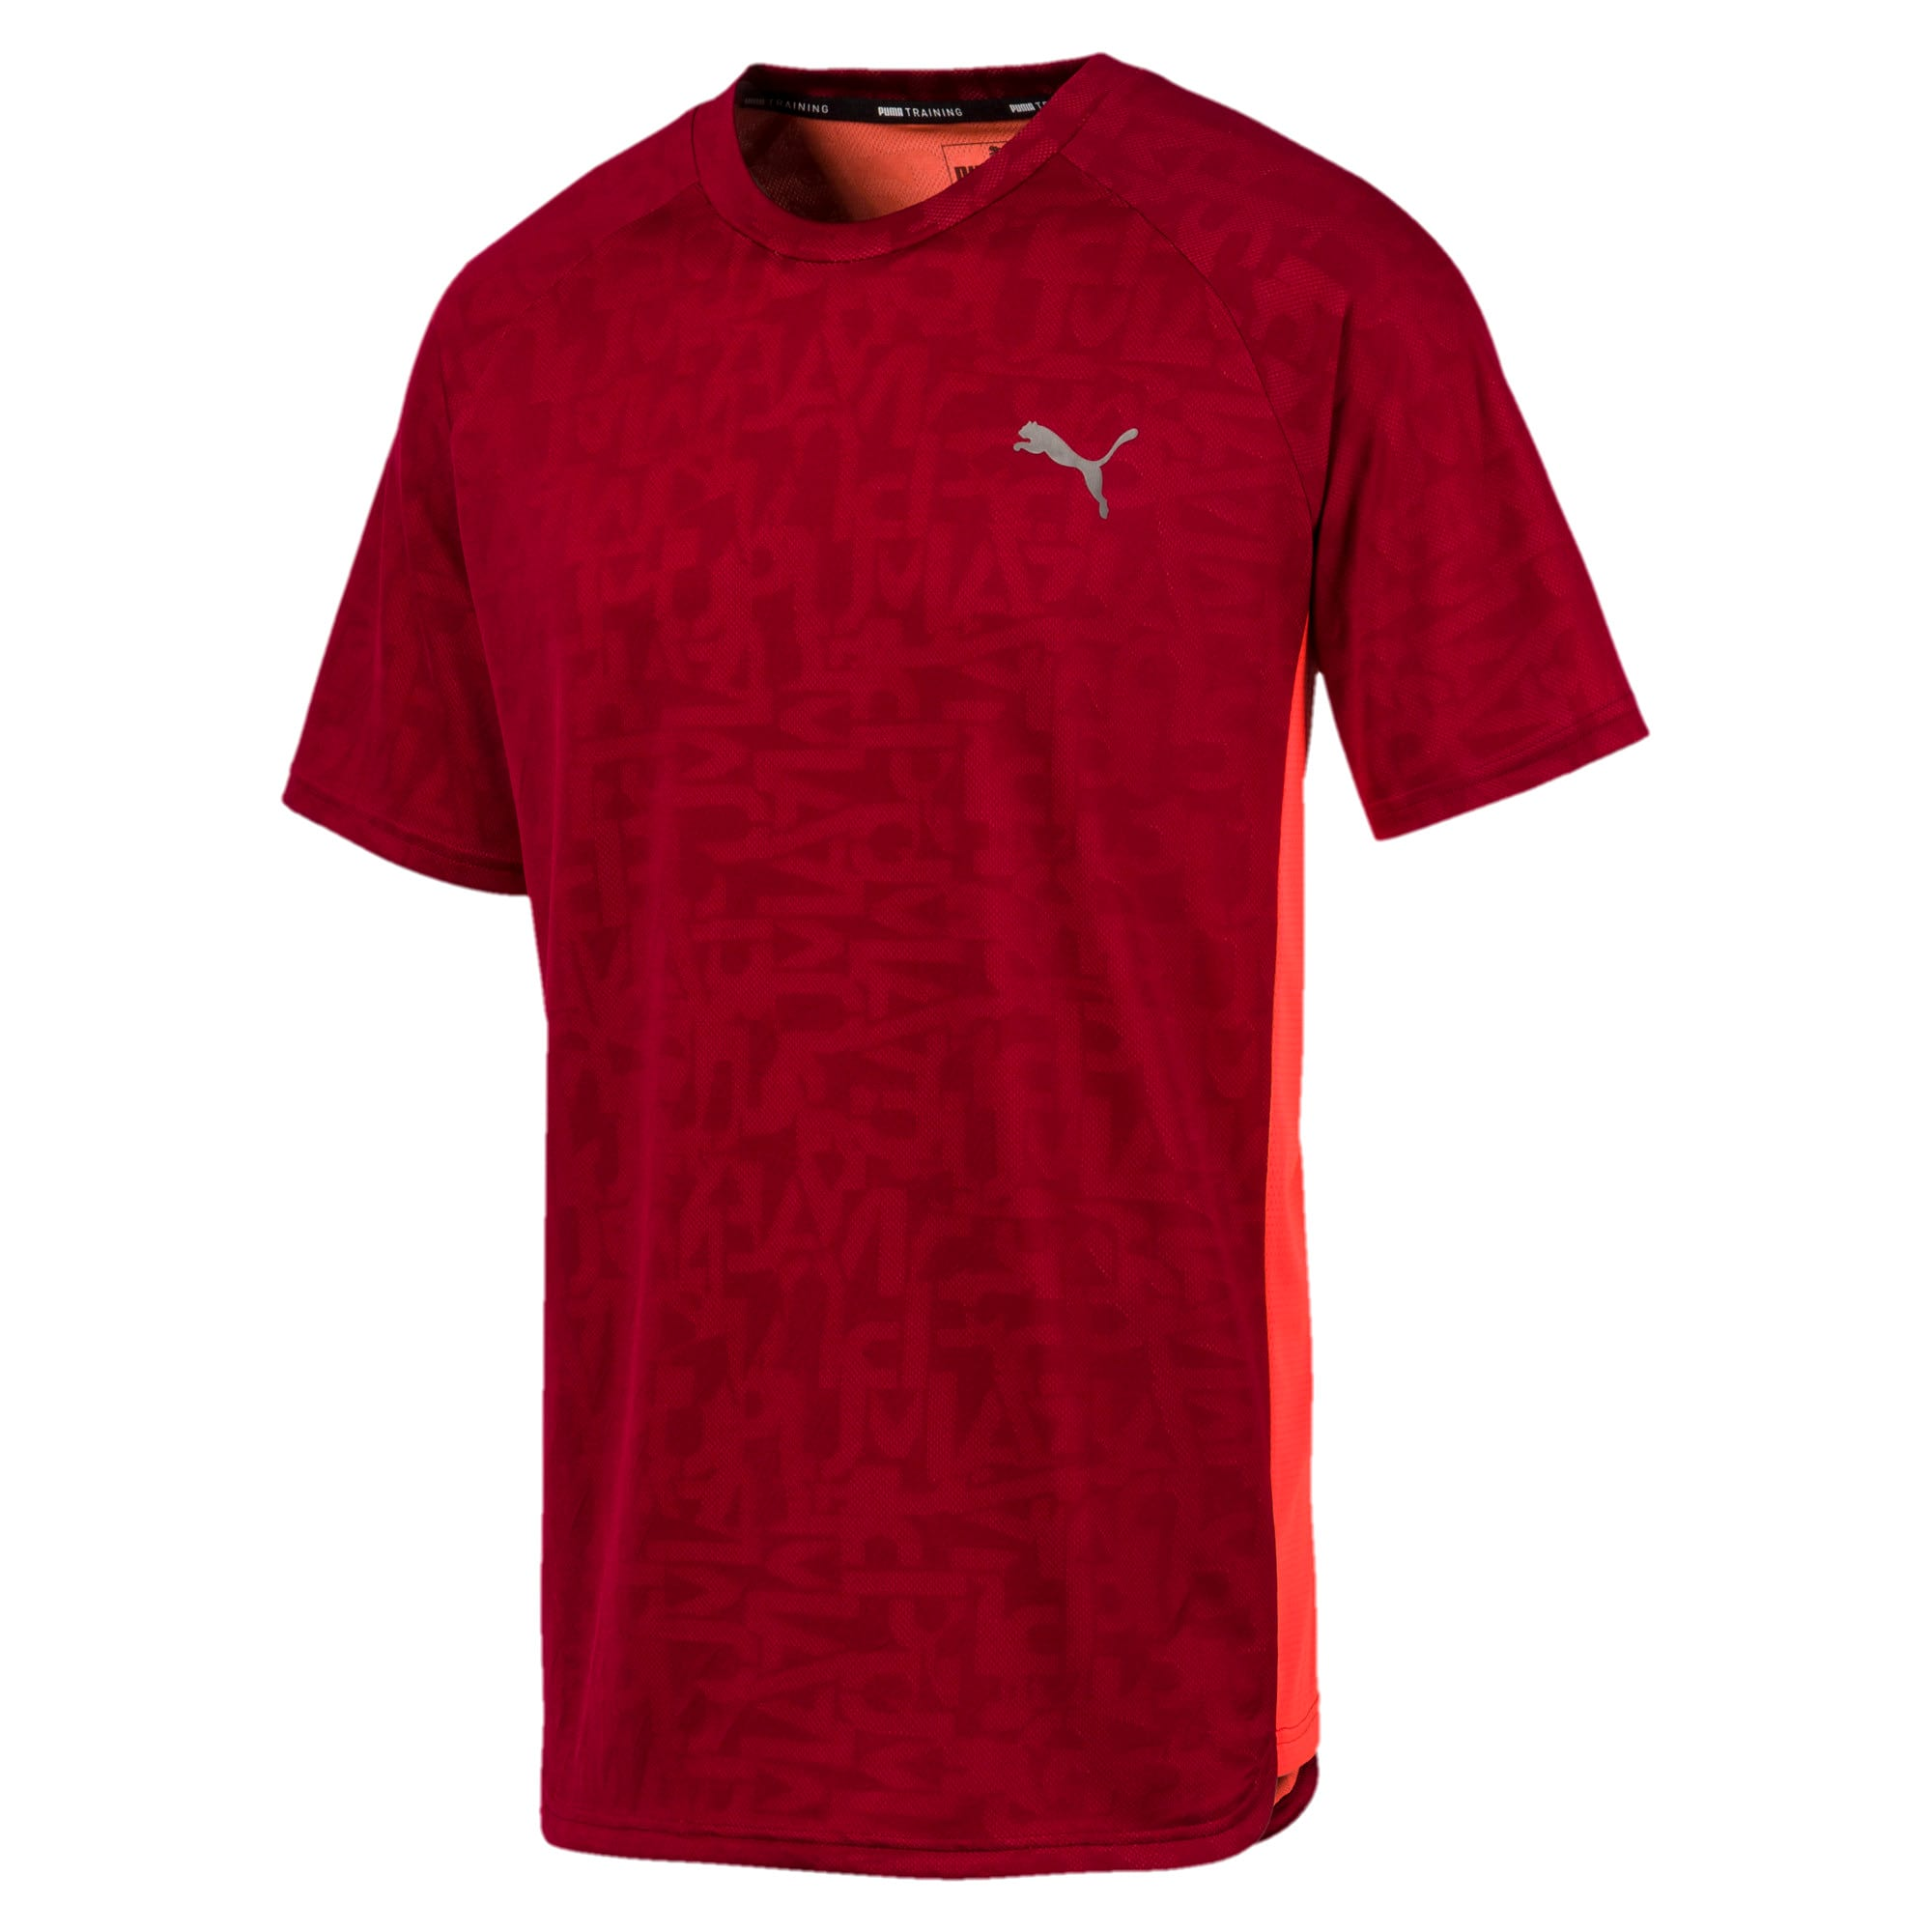 Thumbnail 4 of Power Vent T-shirt voor heren, Rhubarb, medium